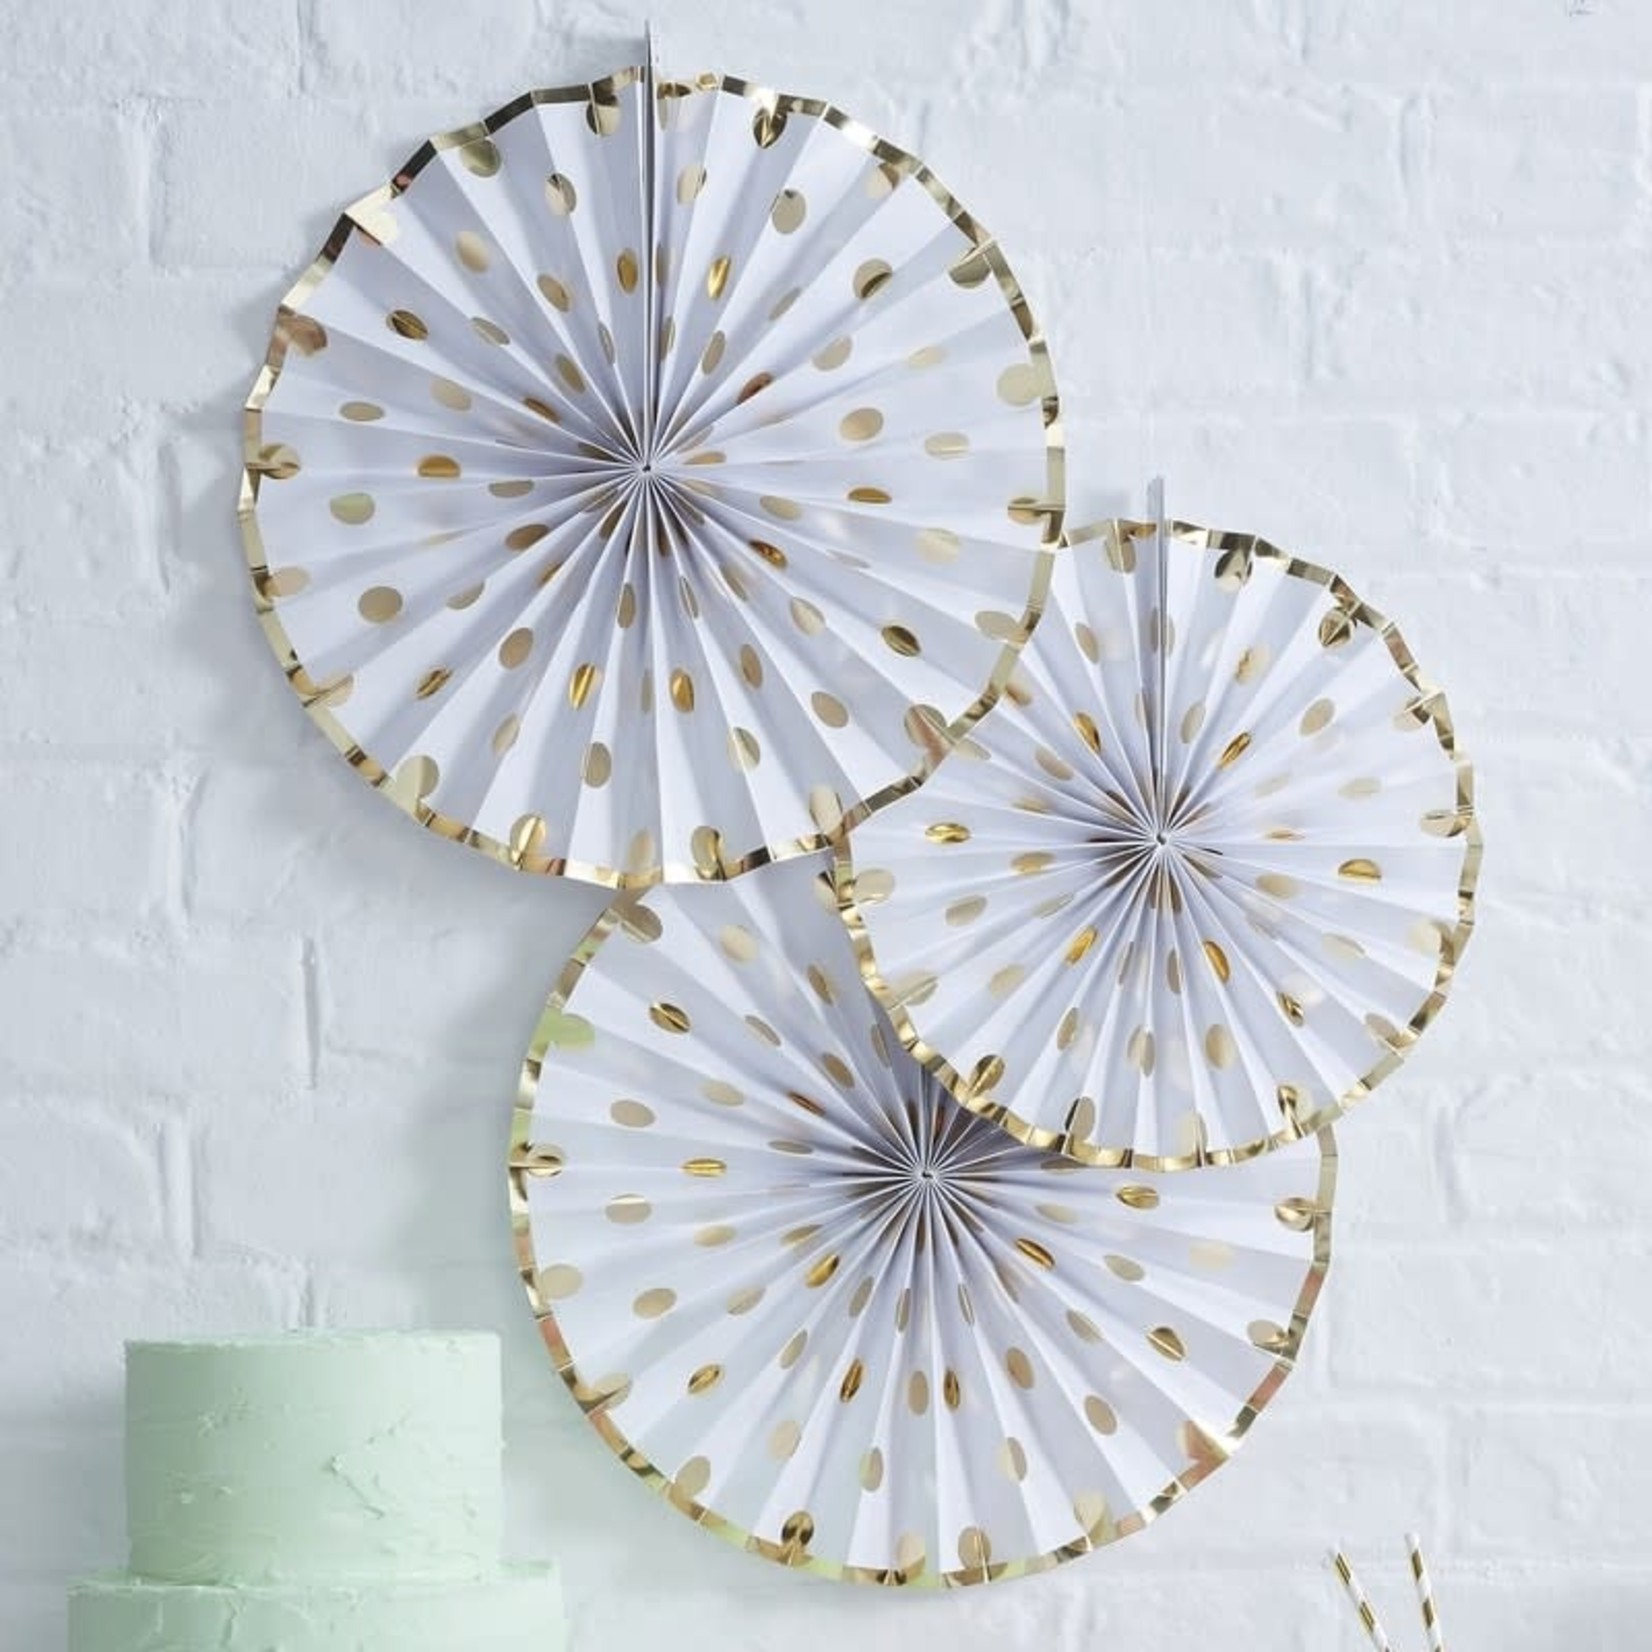 Fan Decorations - Polka Dot - Gold